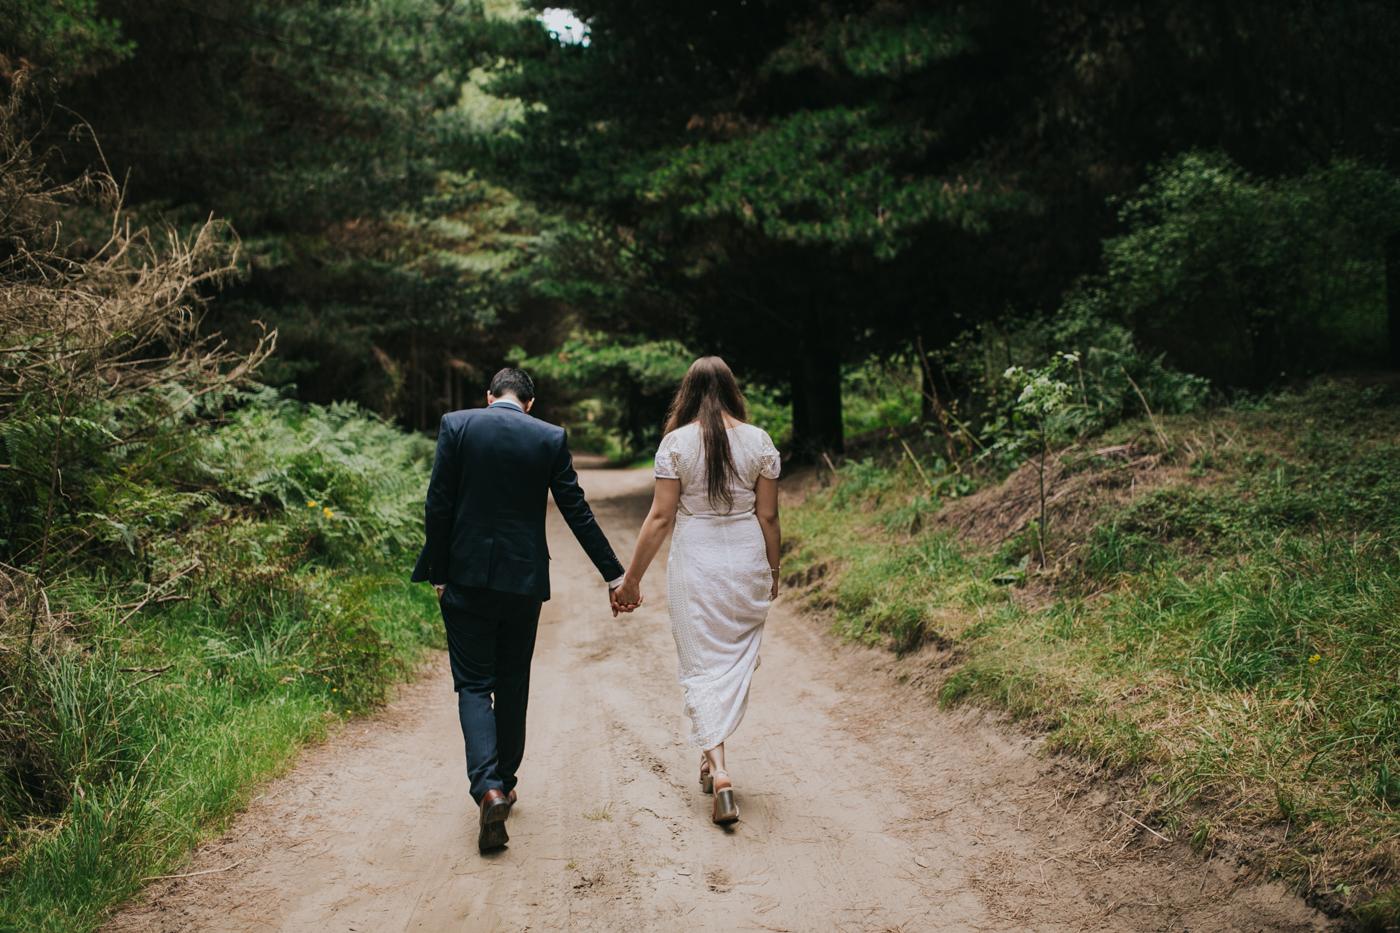 Ariana & Tim - Dunedin, New Zealand Wedding - Destination Wedding - Samantha Heather Photography-166.jpg